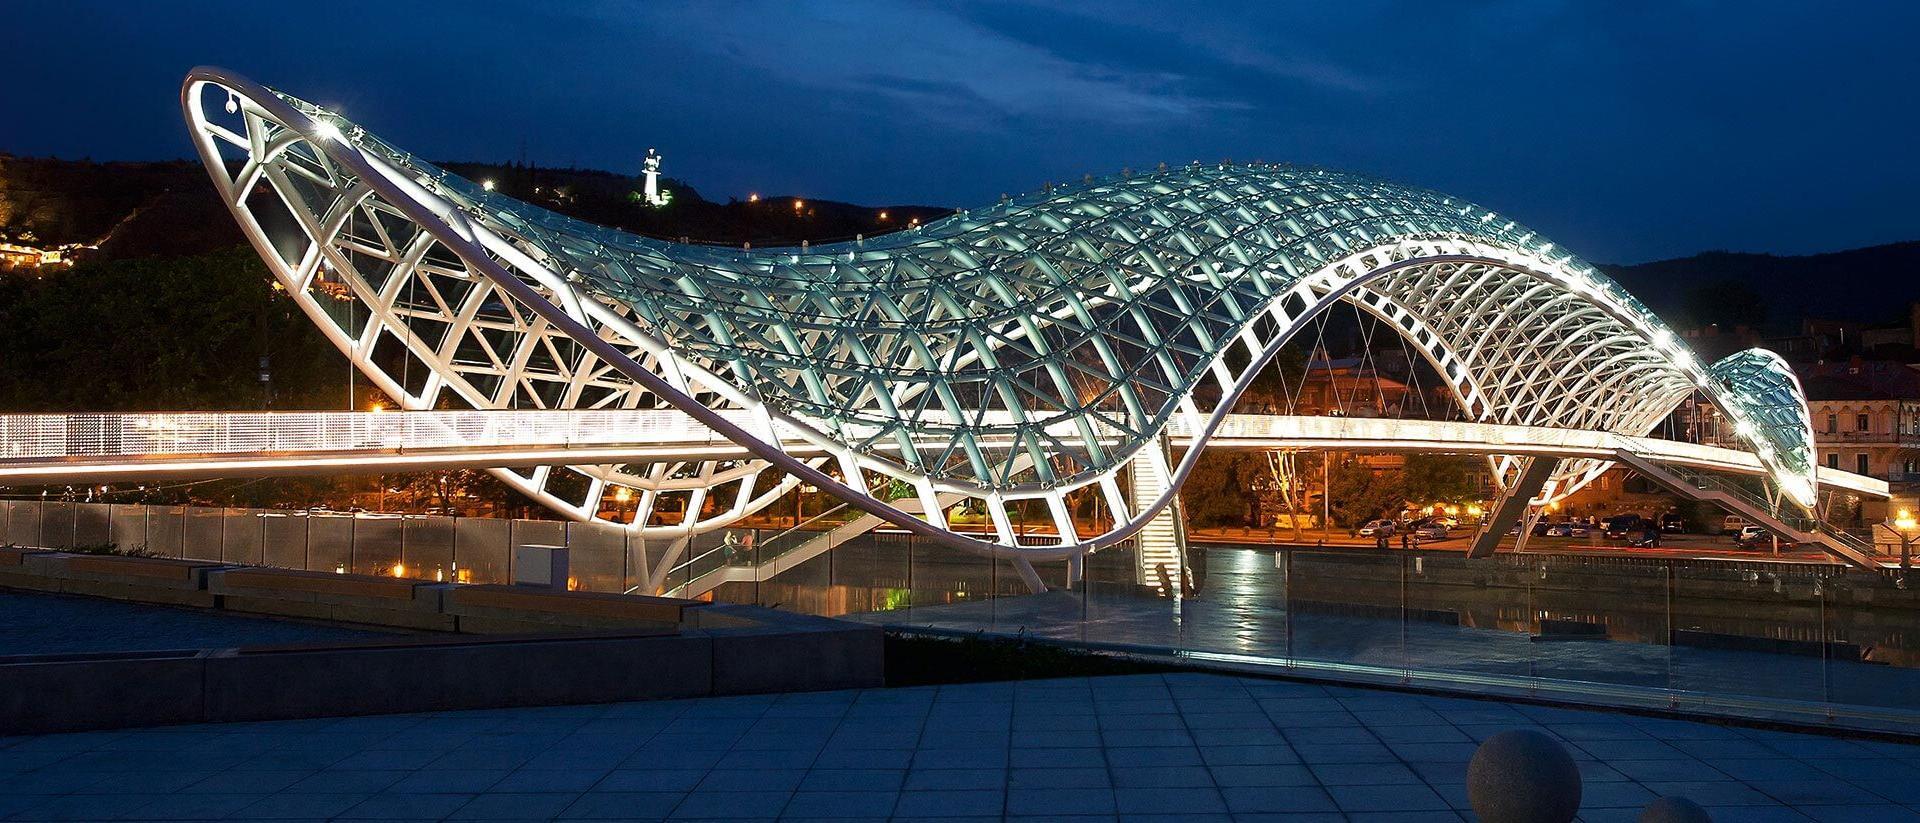 The Bridge of Peace Building